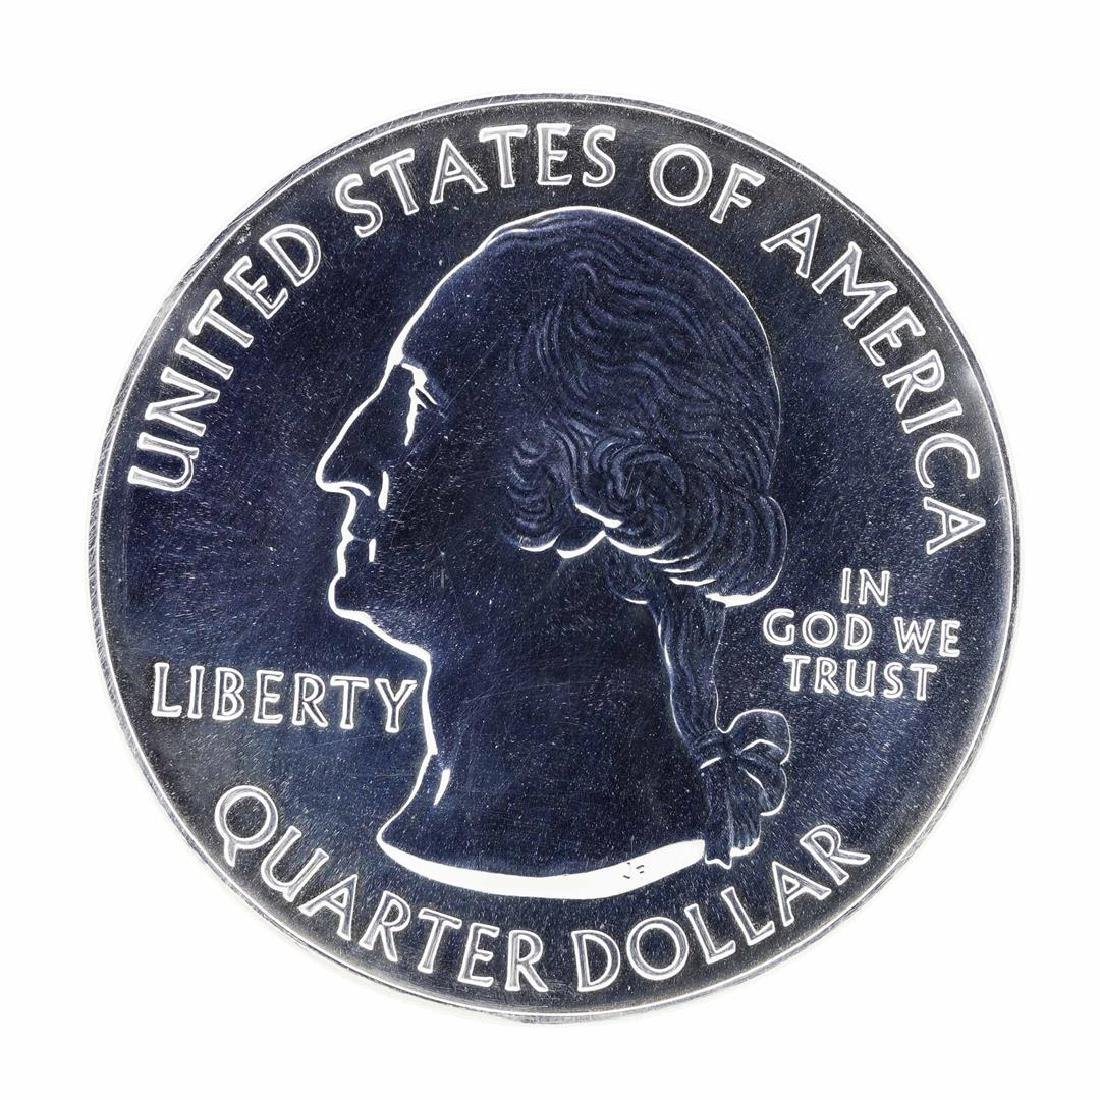 2016 5oz Silver ATB Shawnee Illinois Silver Coin - 2